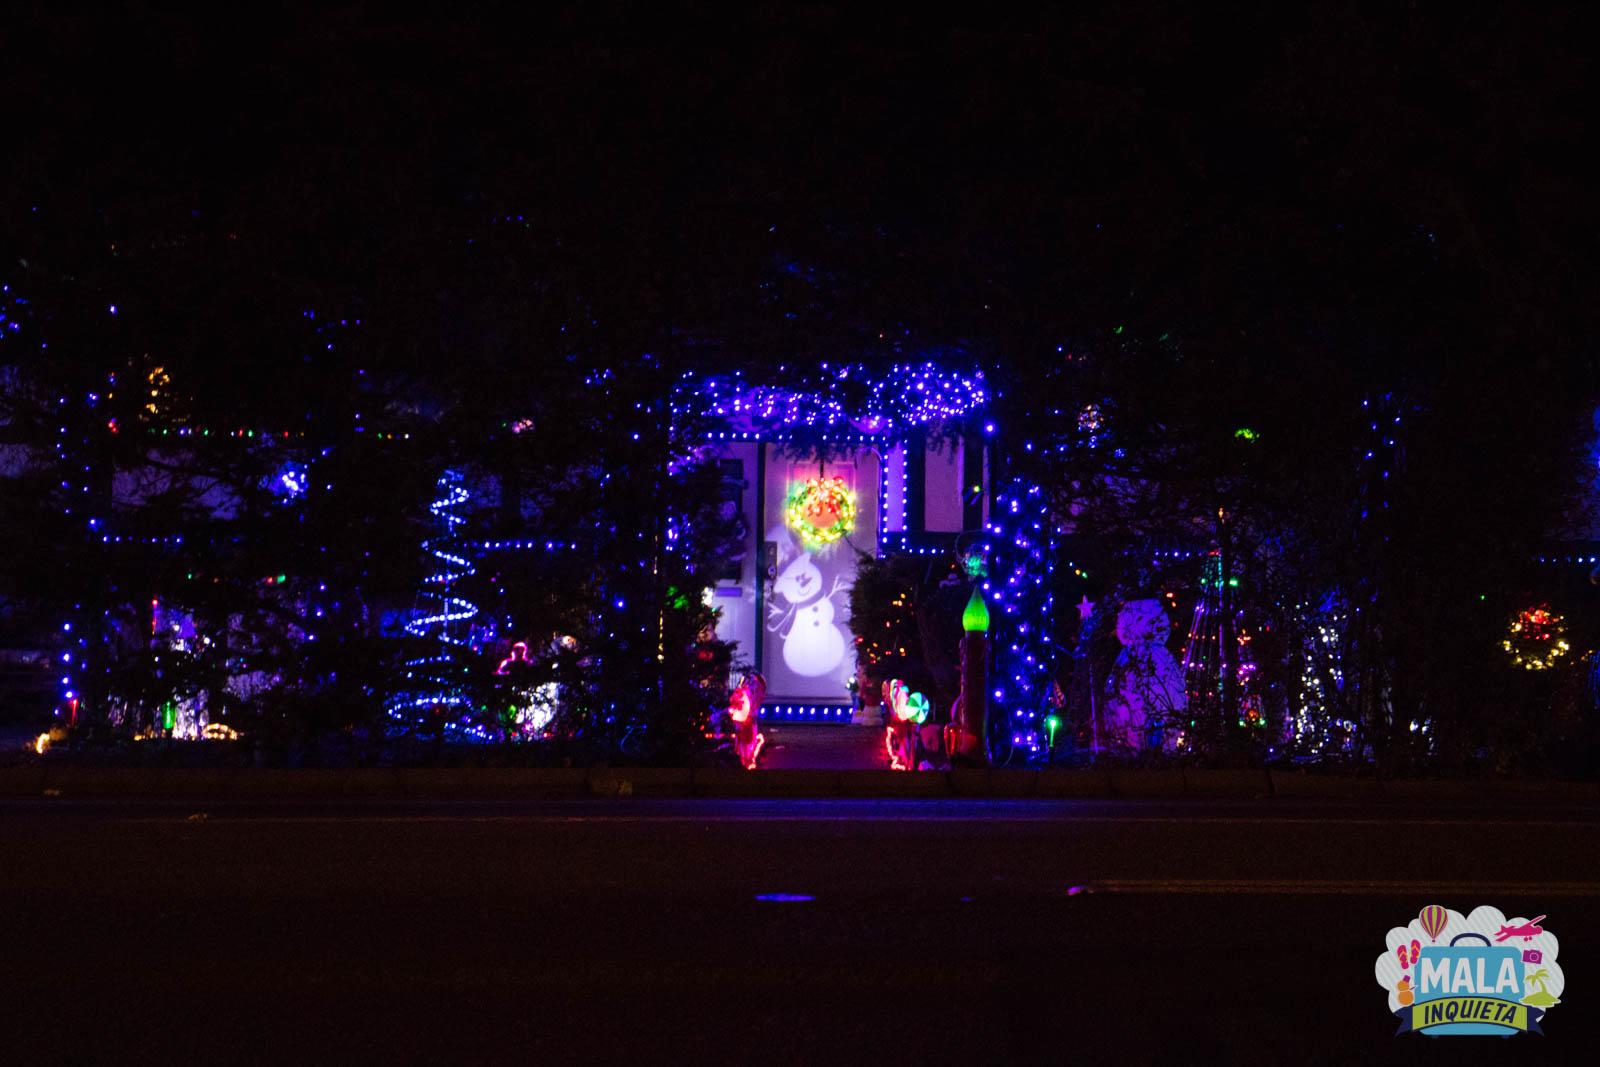 9277 132nd Street - Surrey   Foto: Renata Luppi